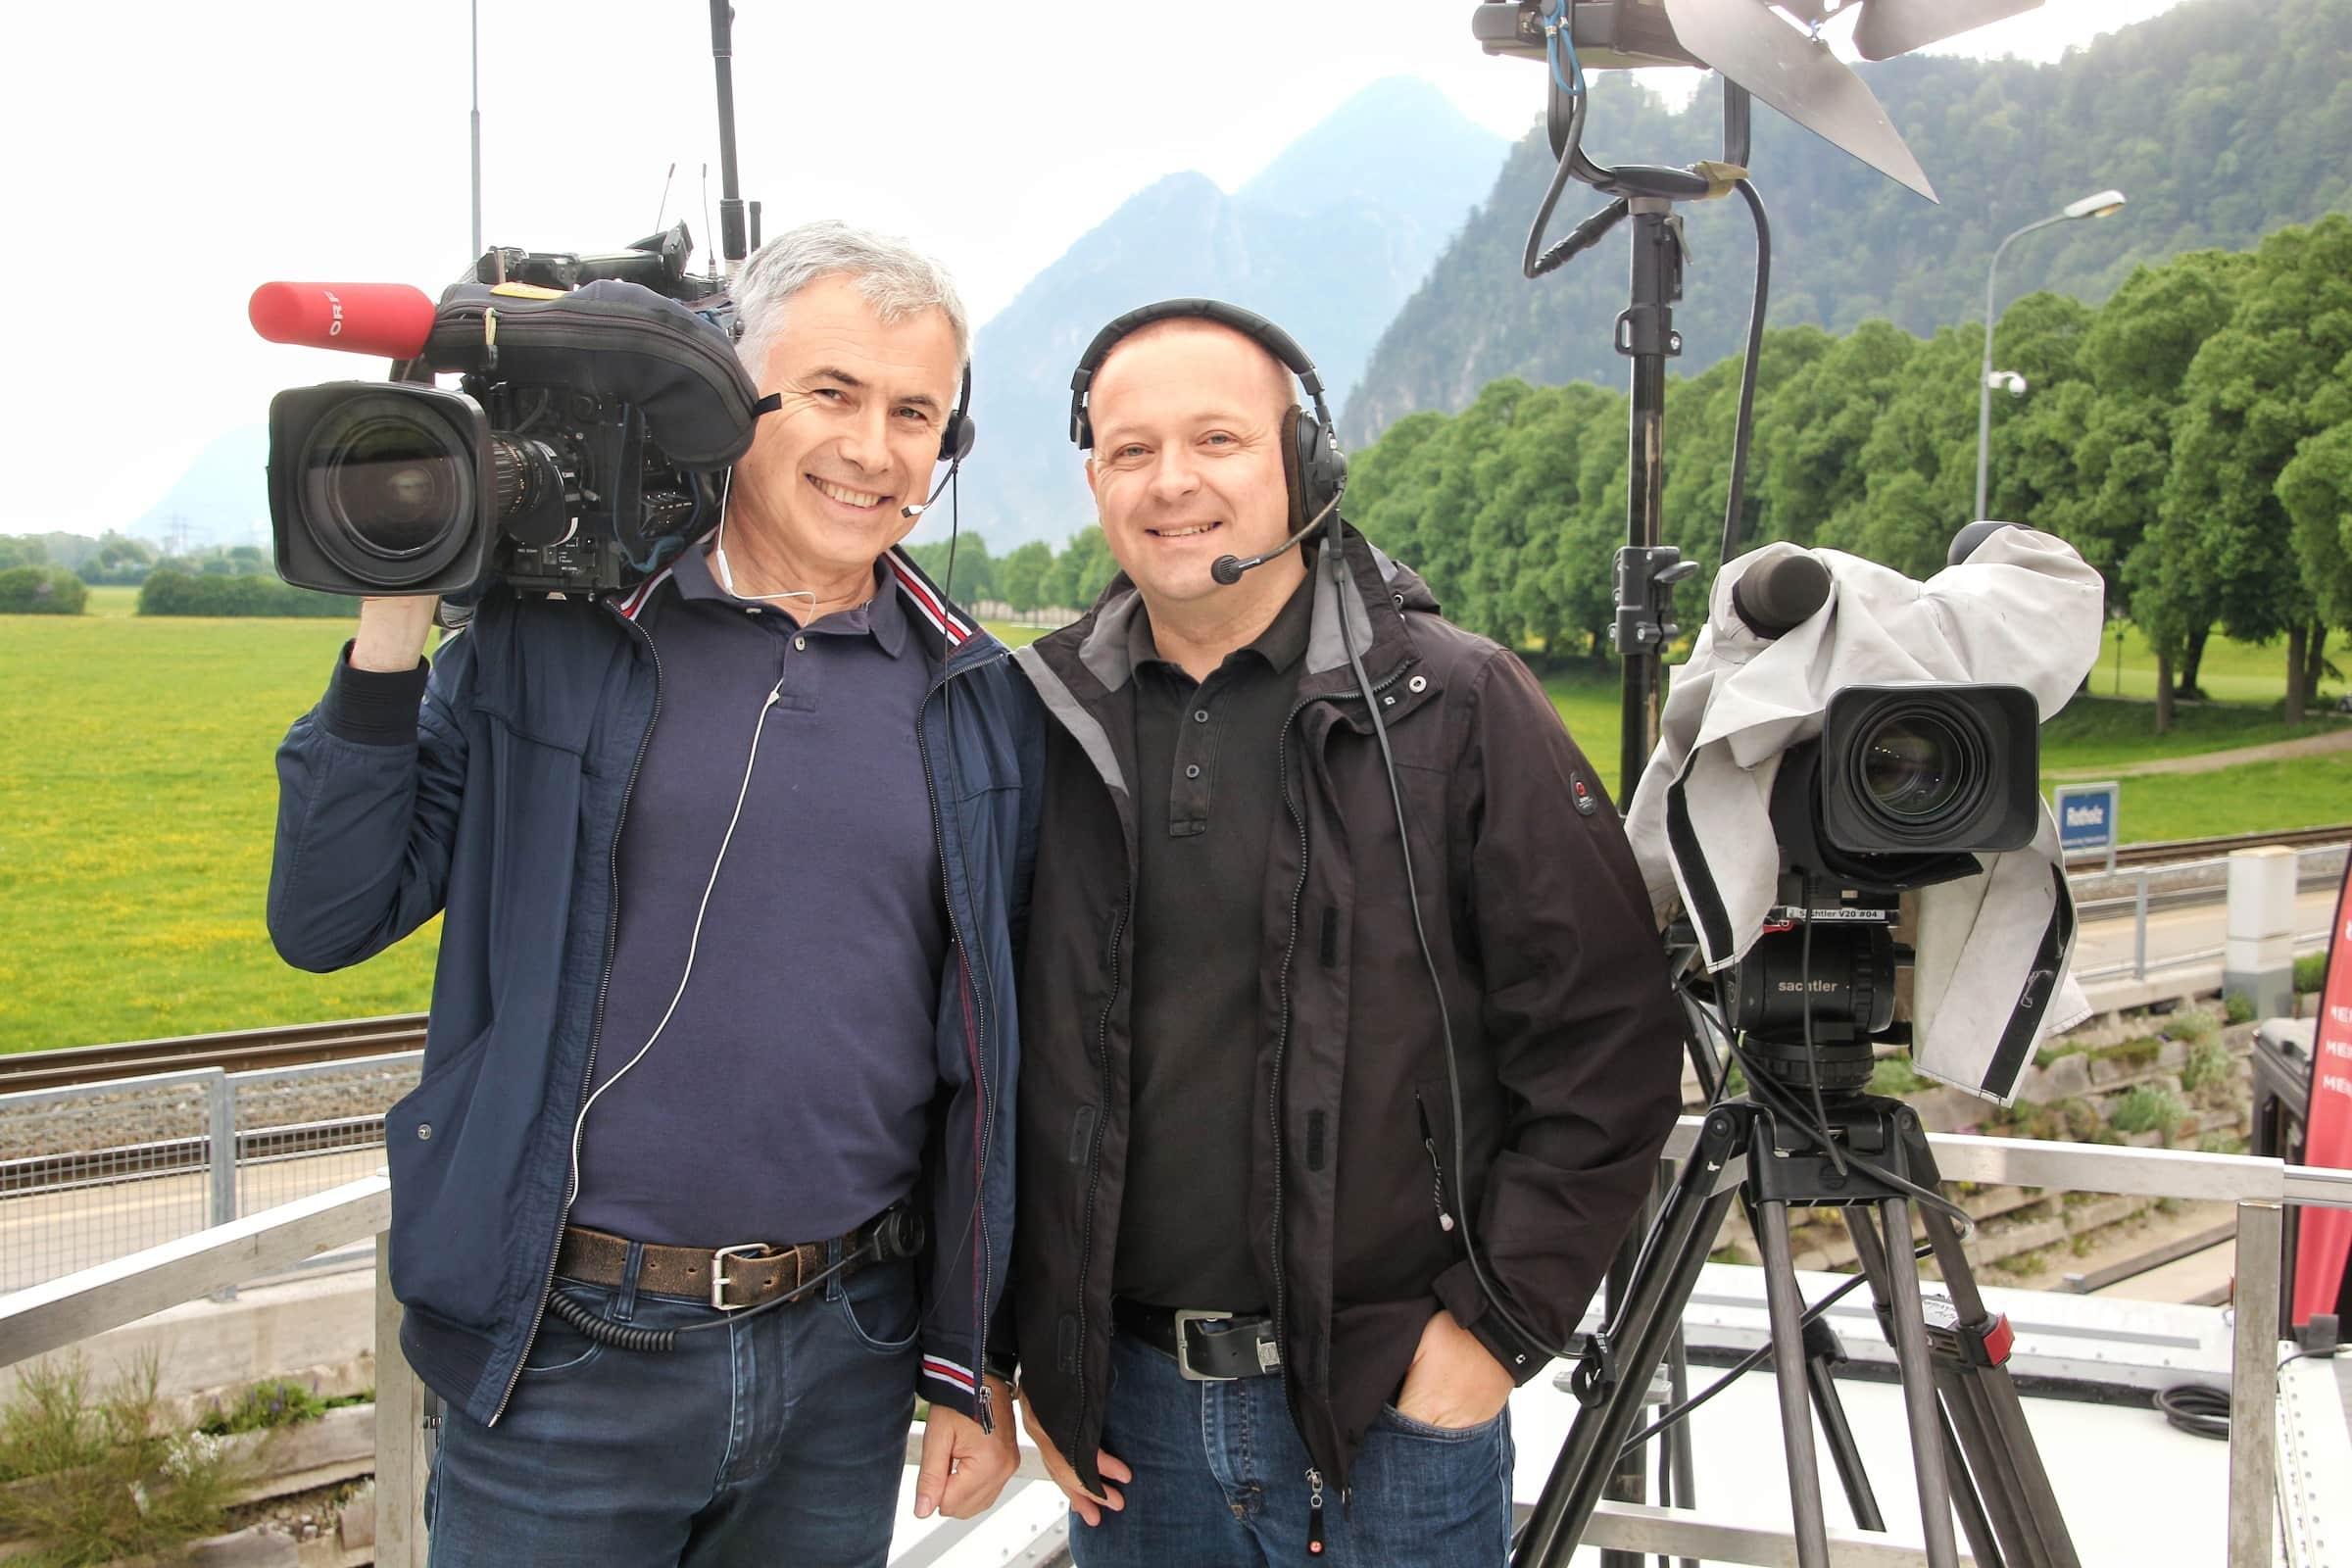 andreas felder kameramann orf unterwegs in österreich 23 02.05.2018 09 10 28 - ORF Unterwegs in Österreich - Tirol